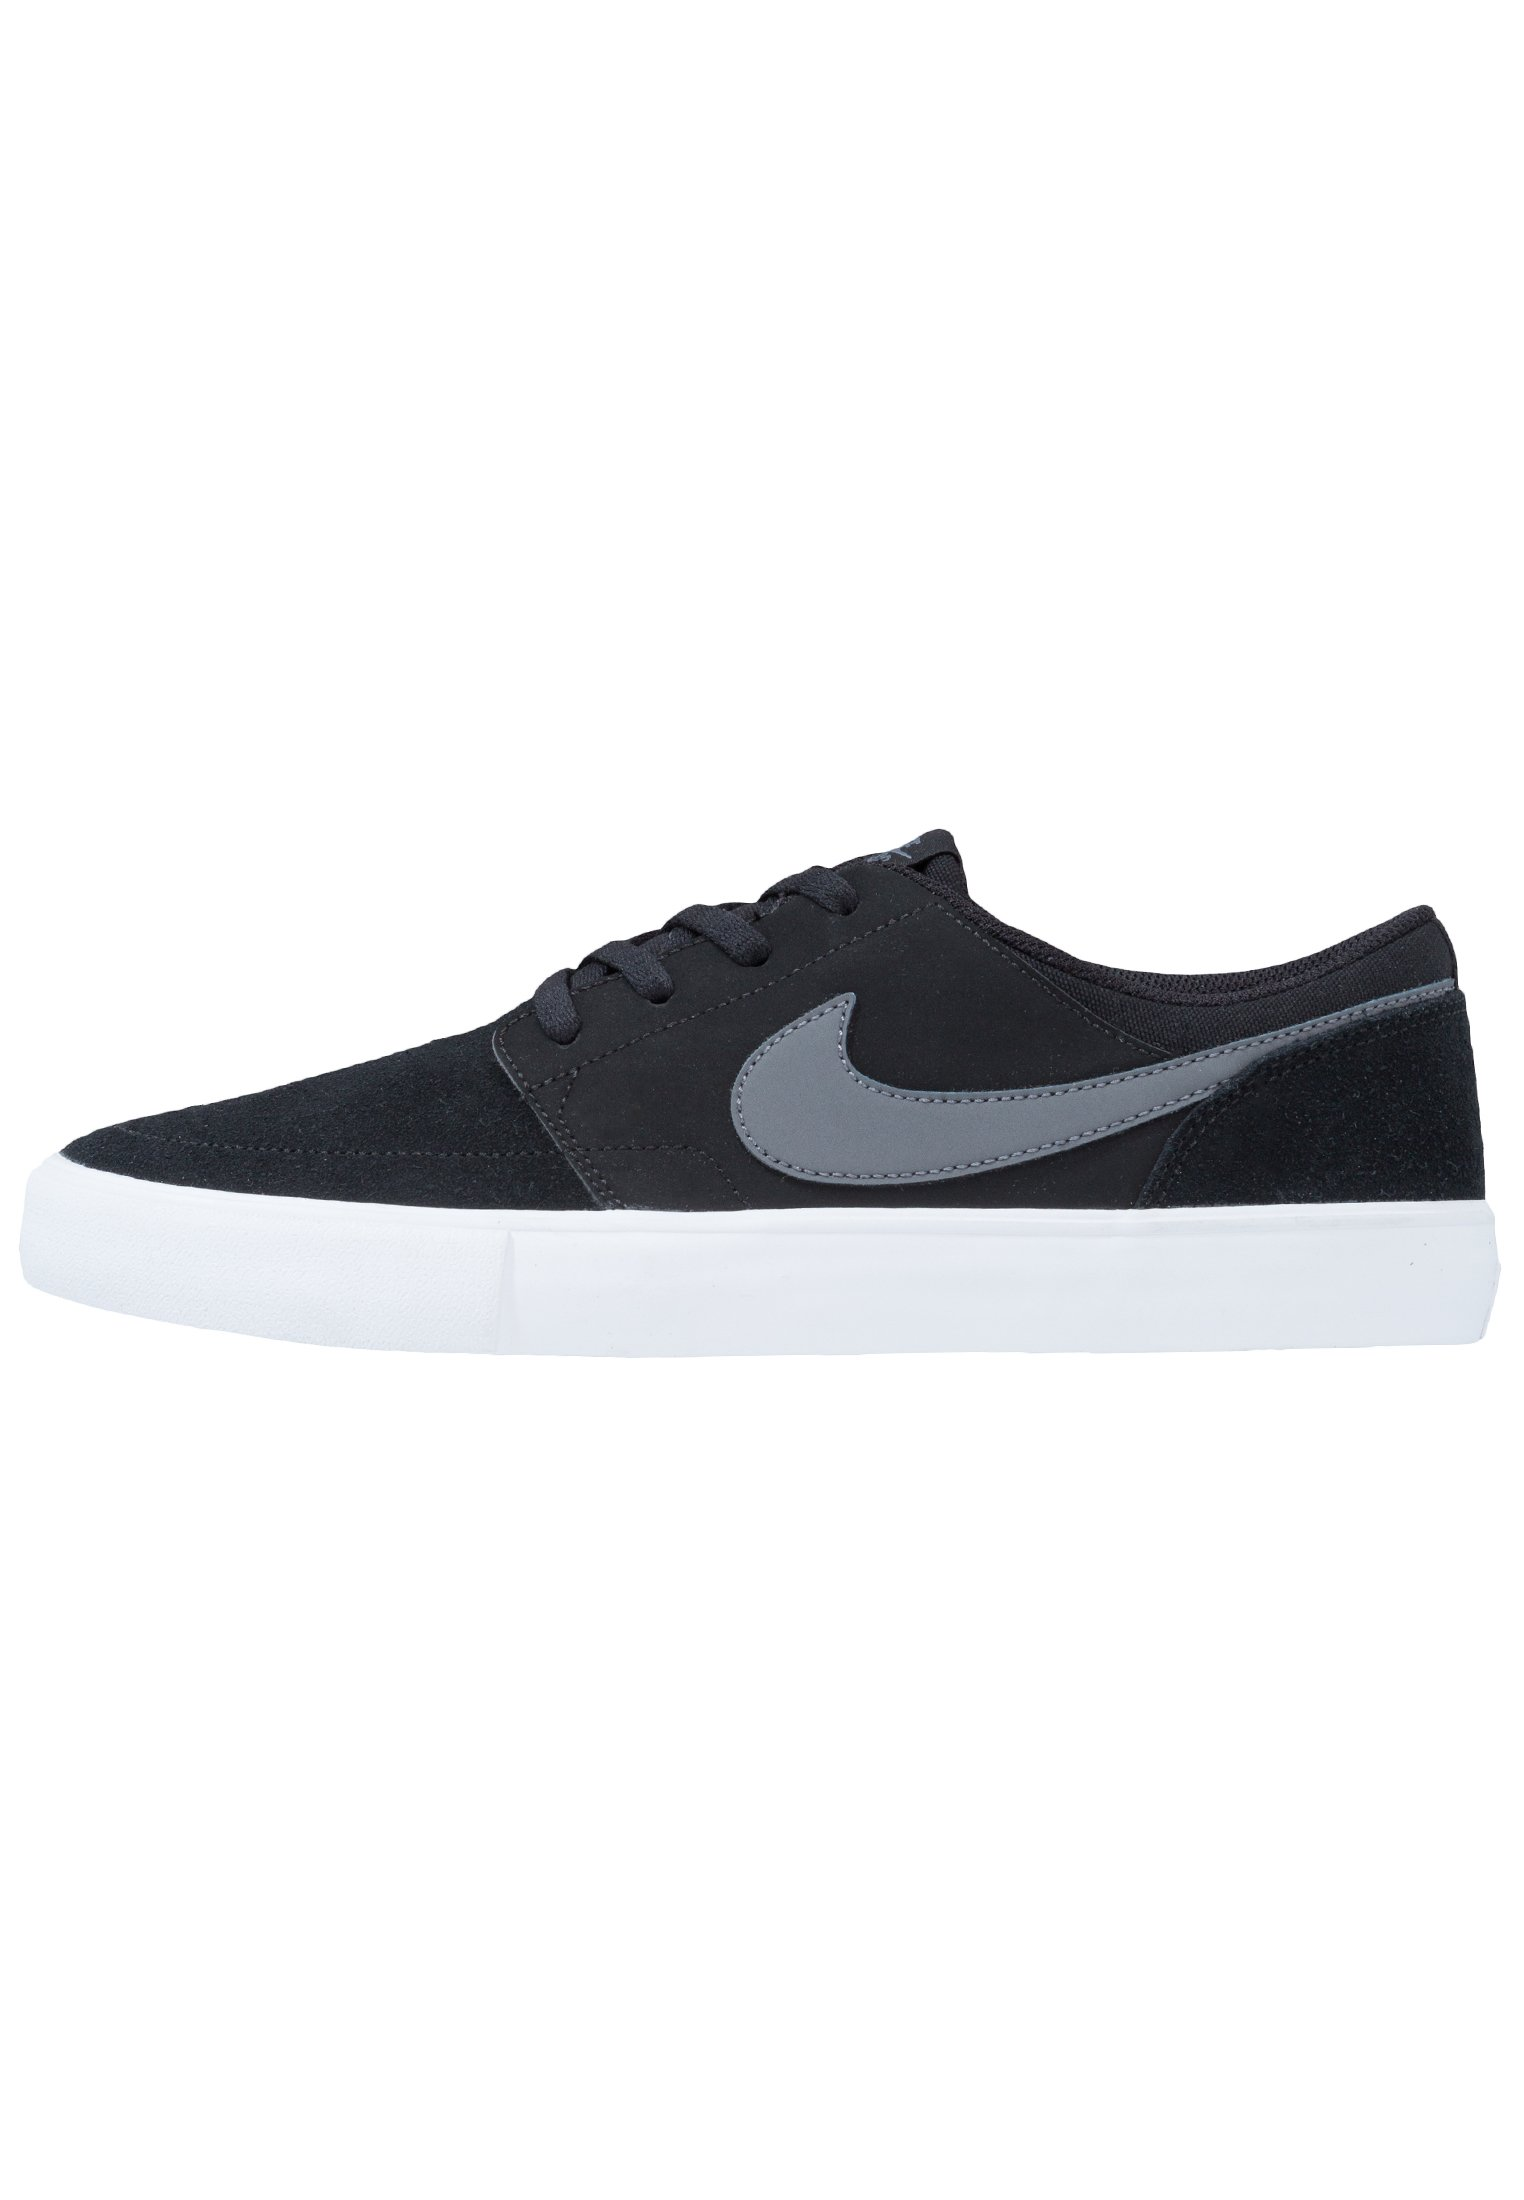 PORTMORE II SOLAR - Chaussures de skate - black/dark grey/white